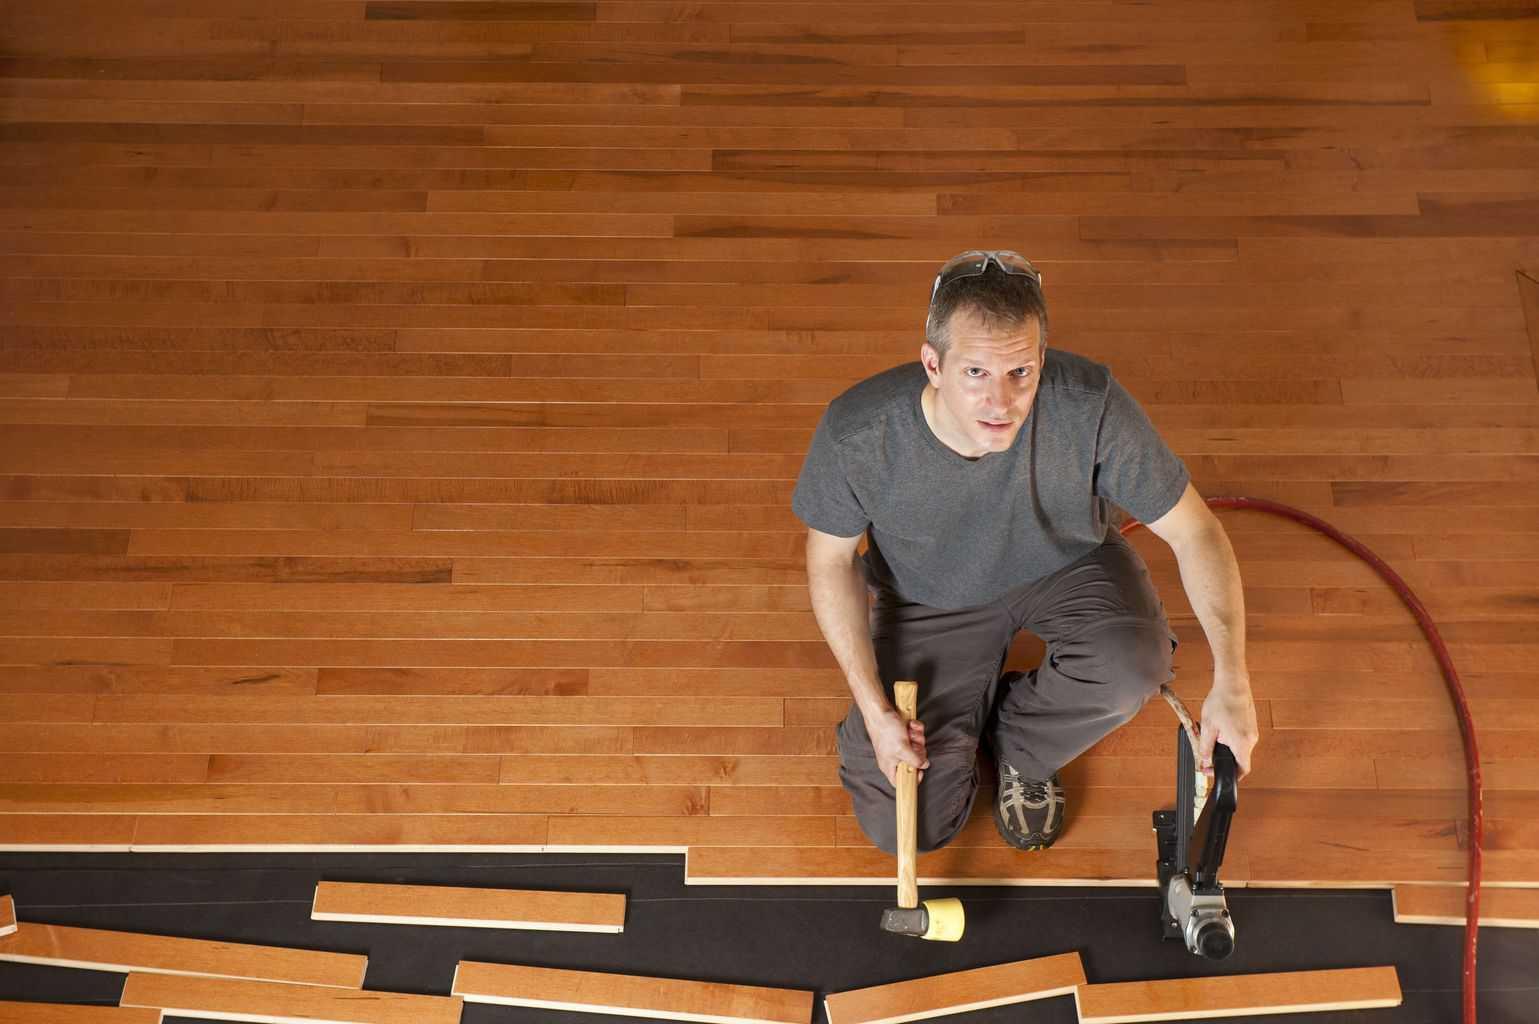 engineered hardwood vs laminate flooring theflooringlady it s more difficult to install than laminate